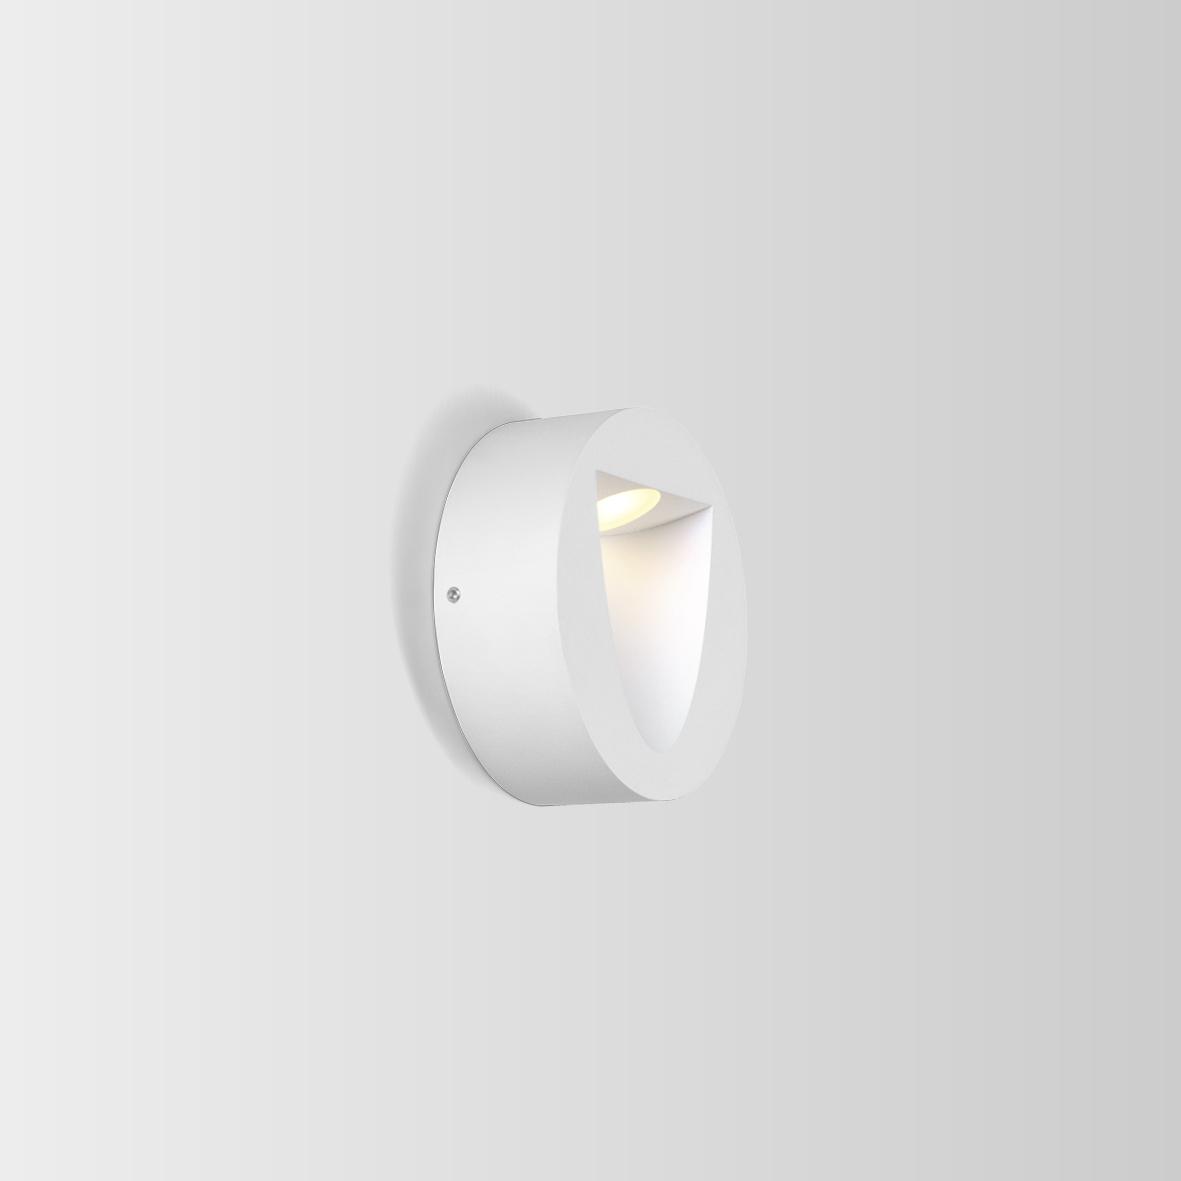 Wever & Ducré+SMILE ON 1.0 LED 3000K VALGE 6W 80CRI 220-240VAC, välisvalgusti seinale (uus, pakendis)